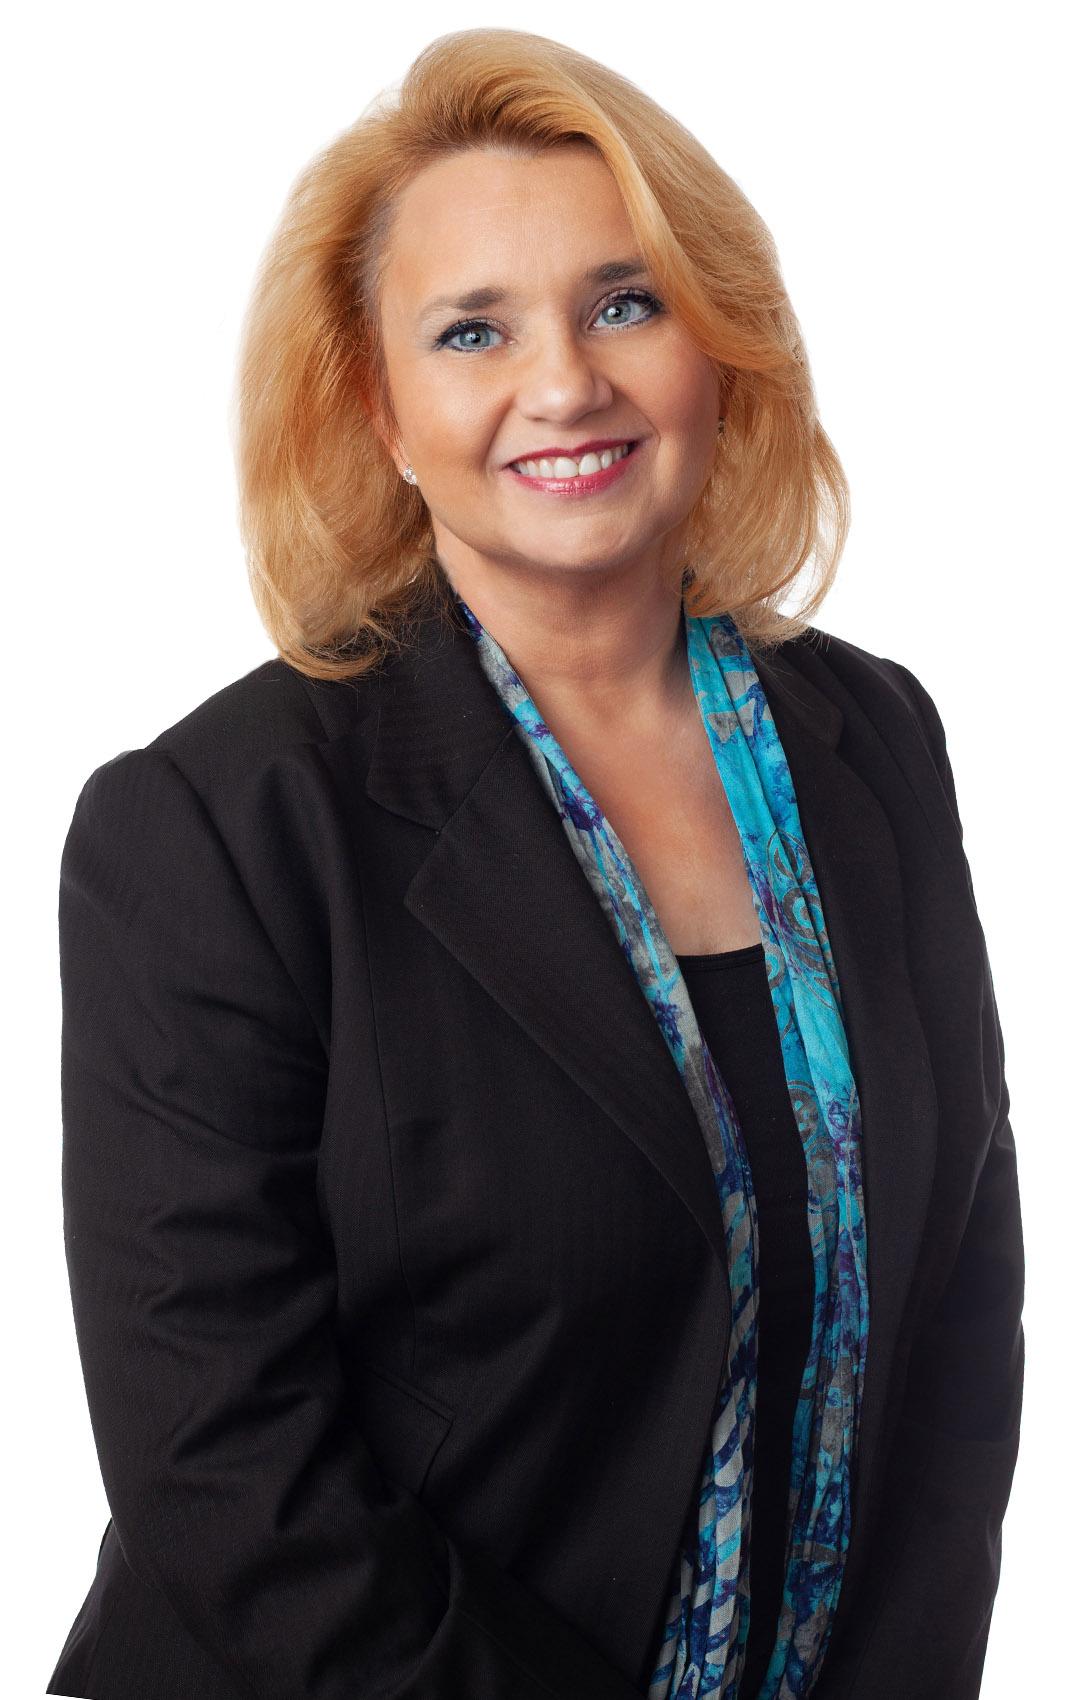 Gina Ginn Greenwood, JD, CIPP/US